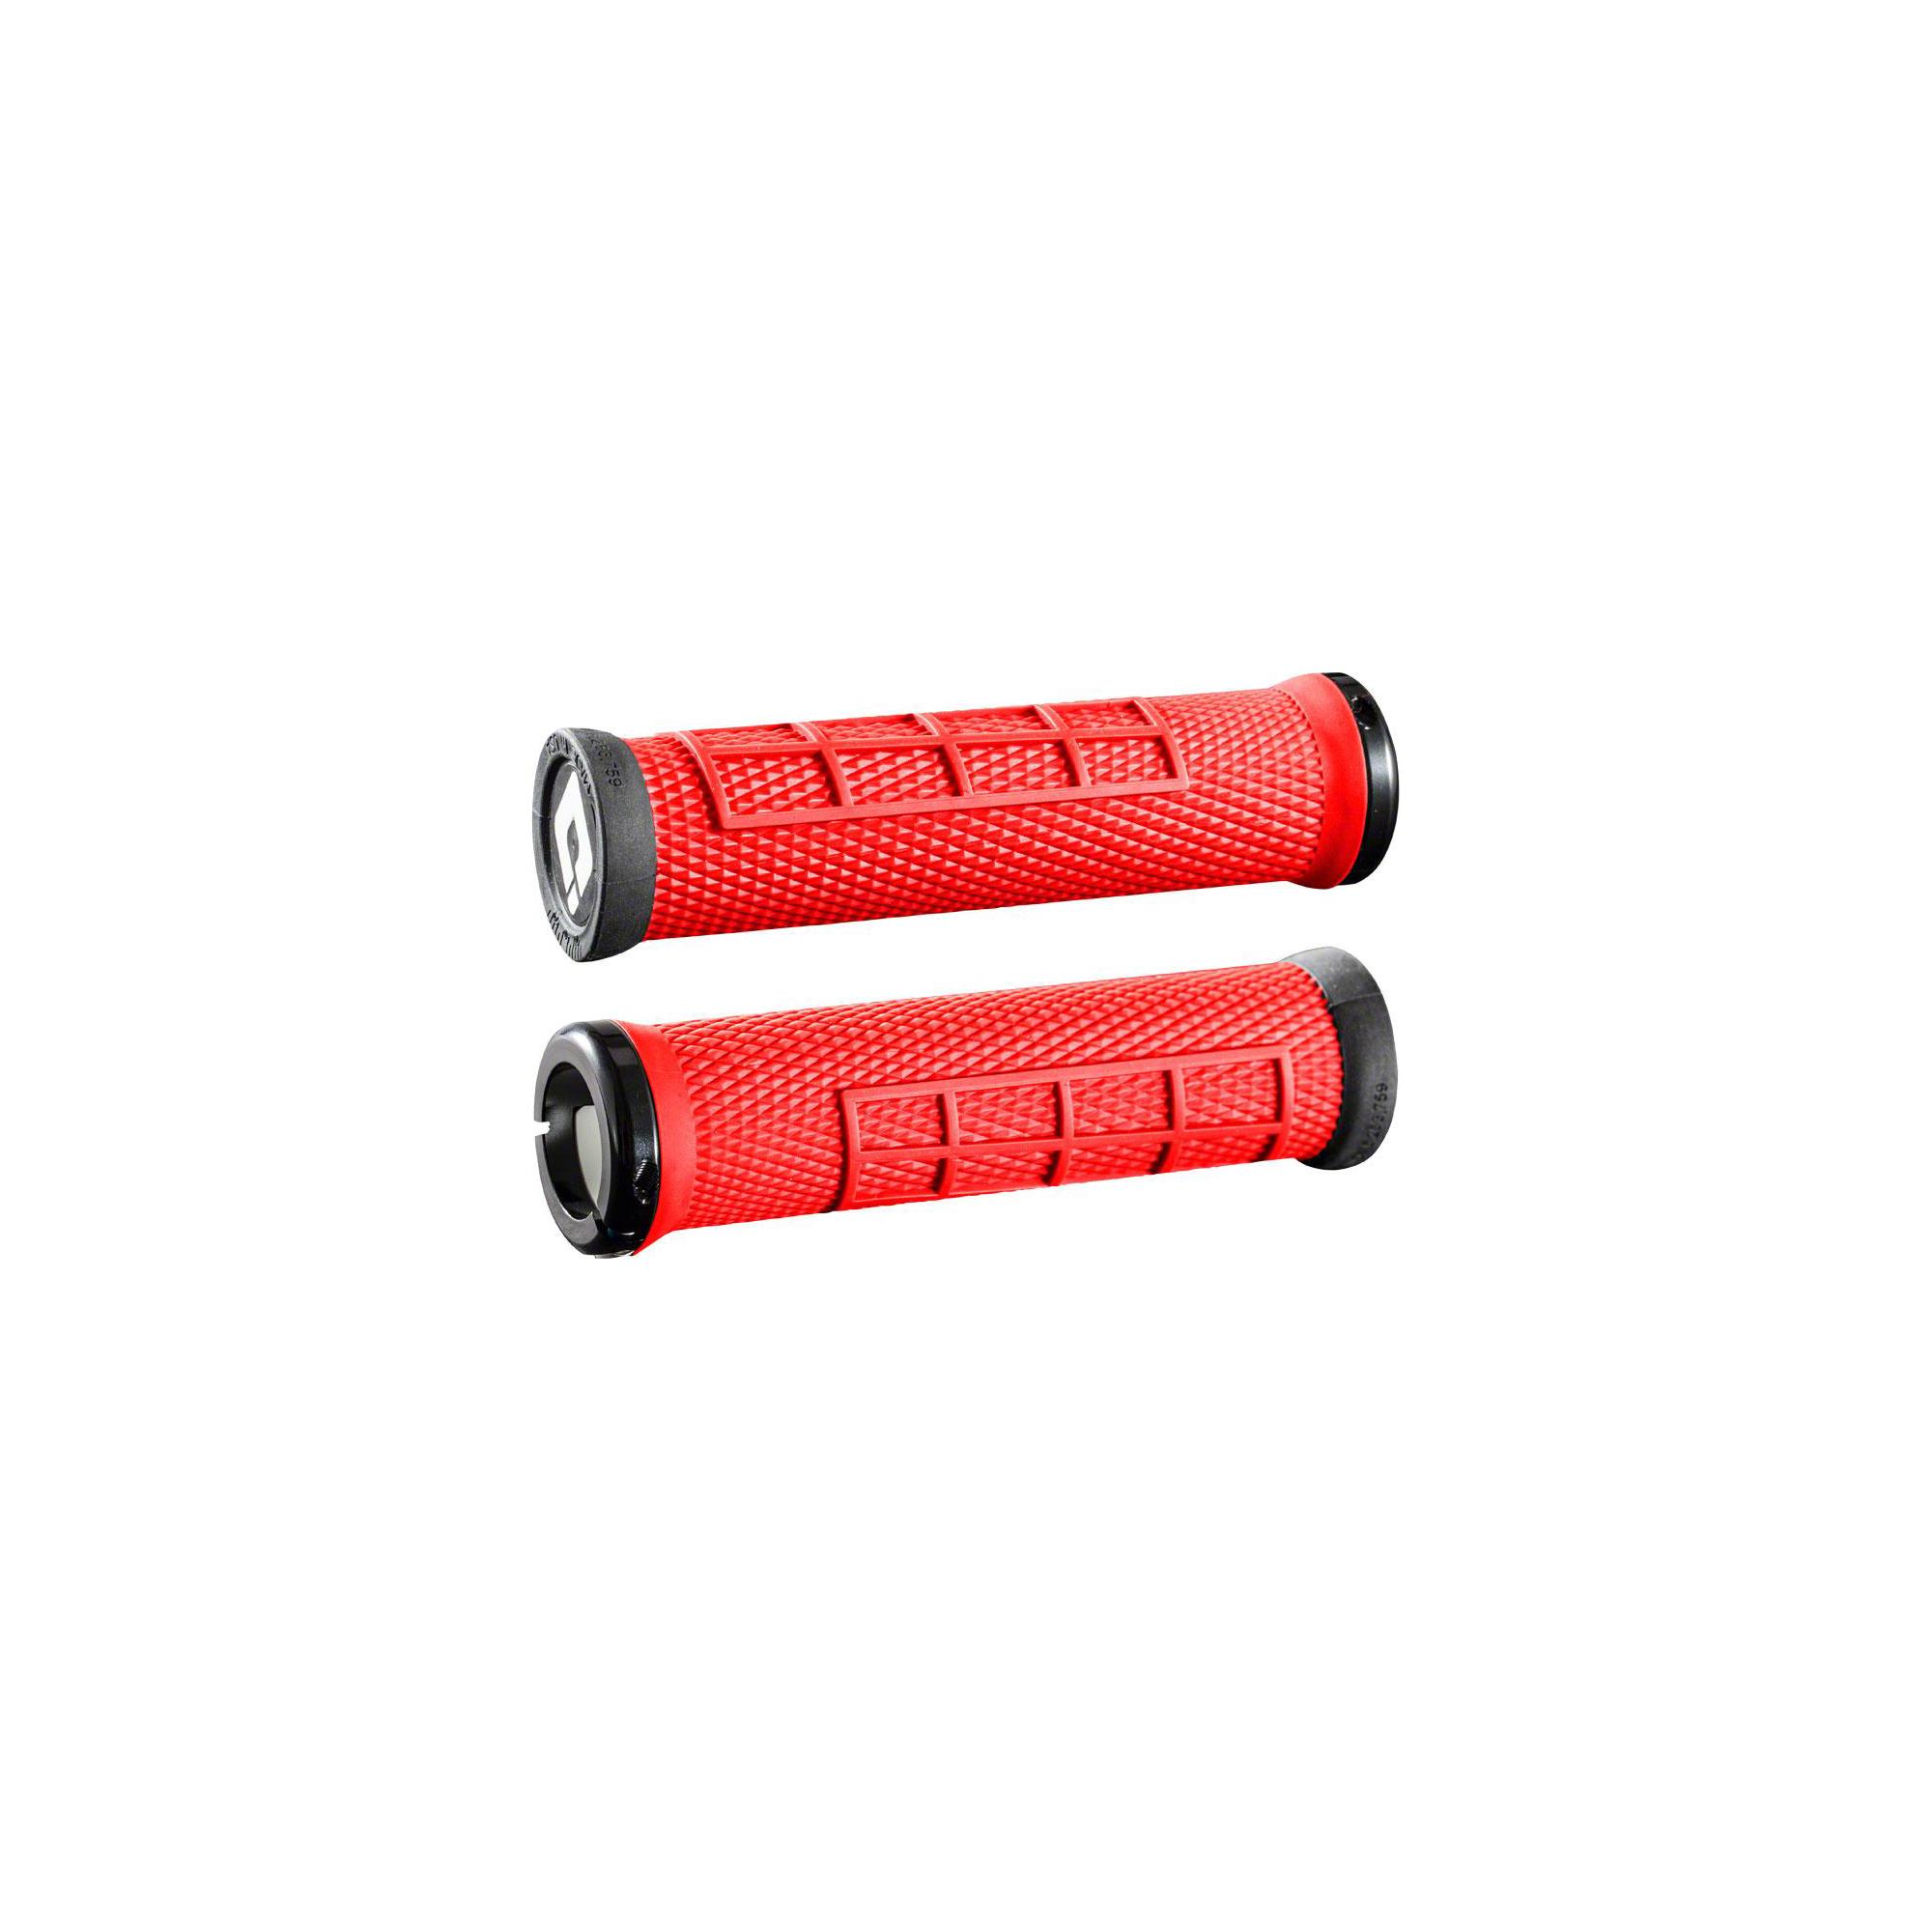 "ODI /""O/"" Grip 144mm BMX Grip Pair~ Red"